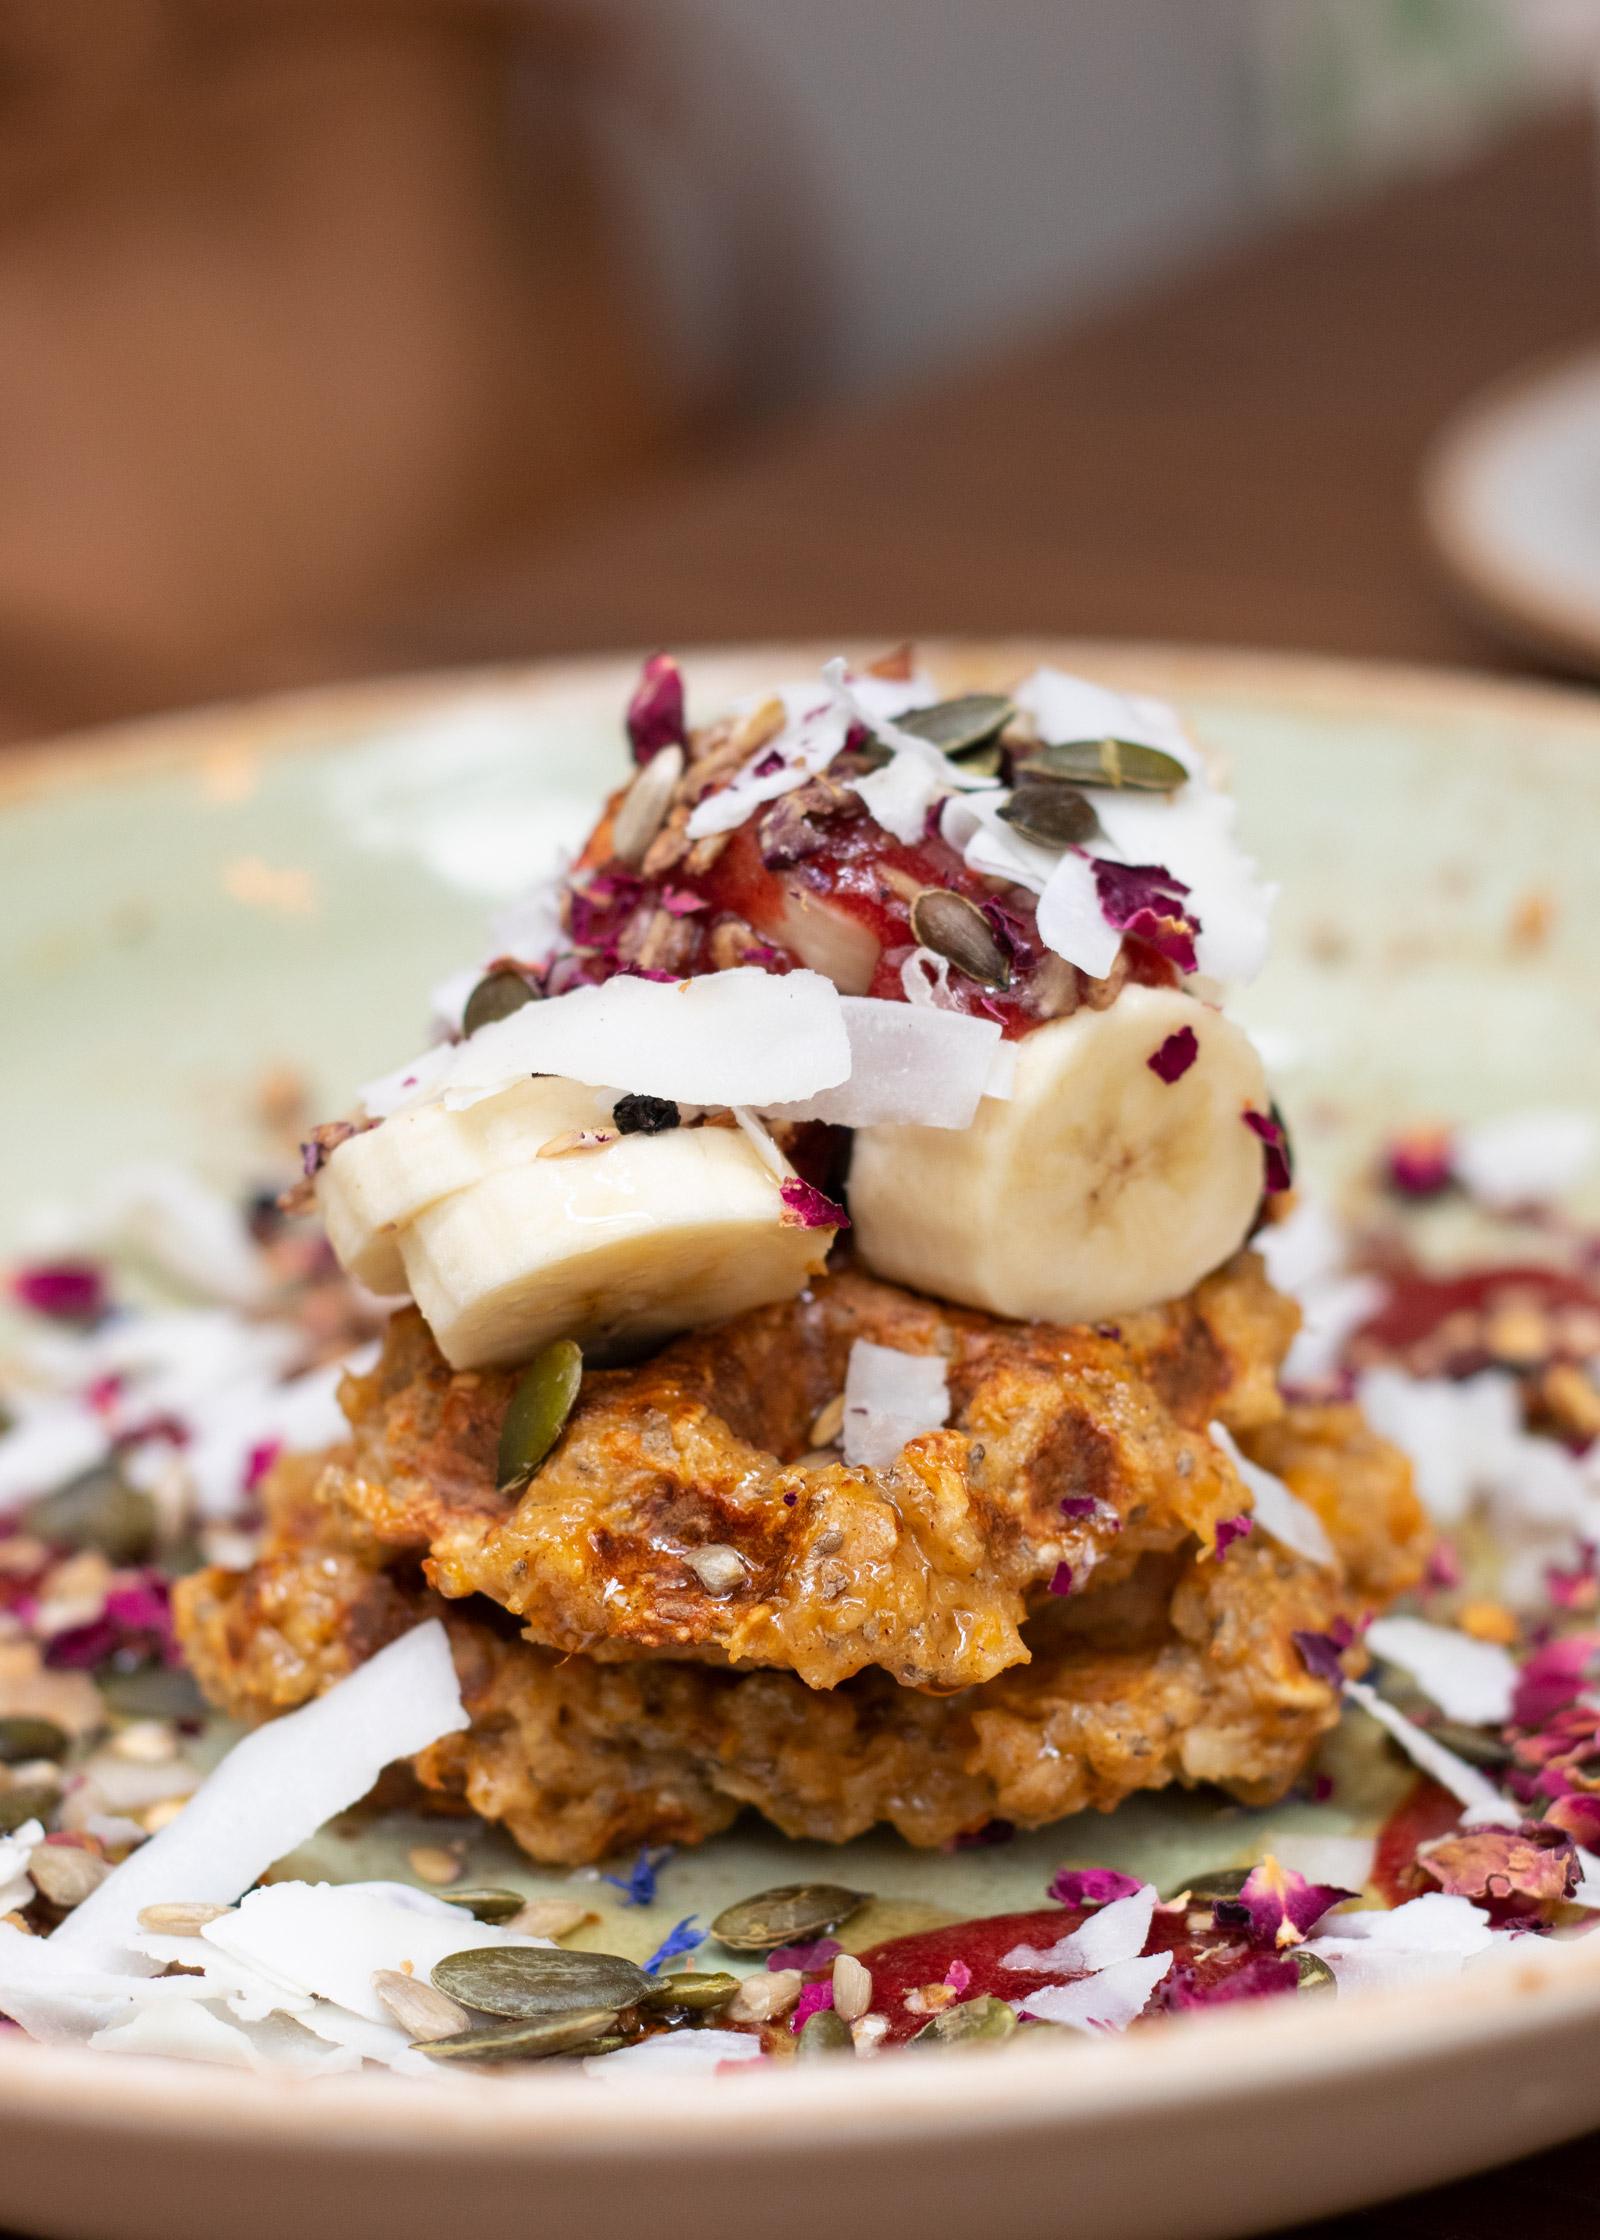 Raspberry-&-Caramel-Oat-Waffles---Vegan-Brunch